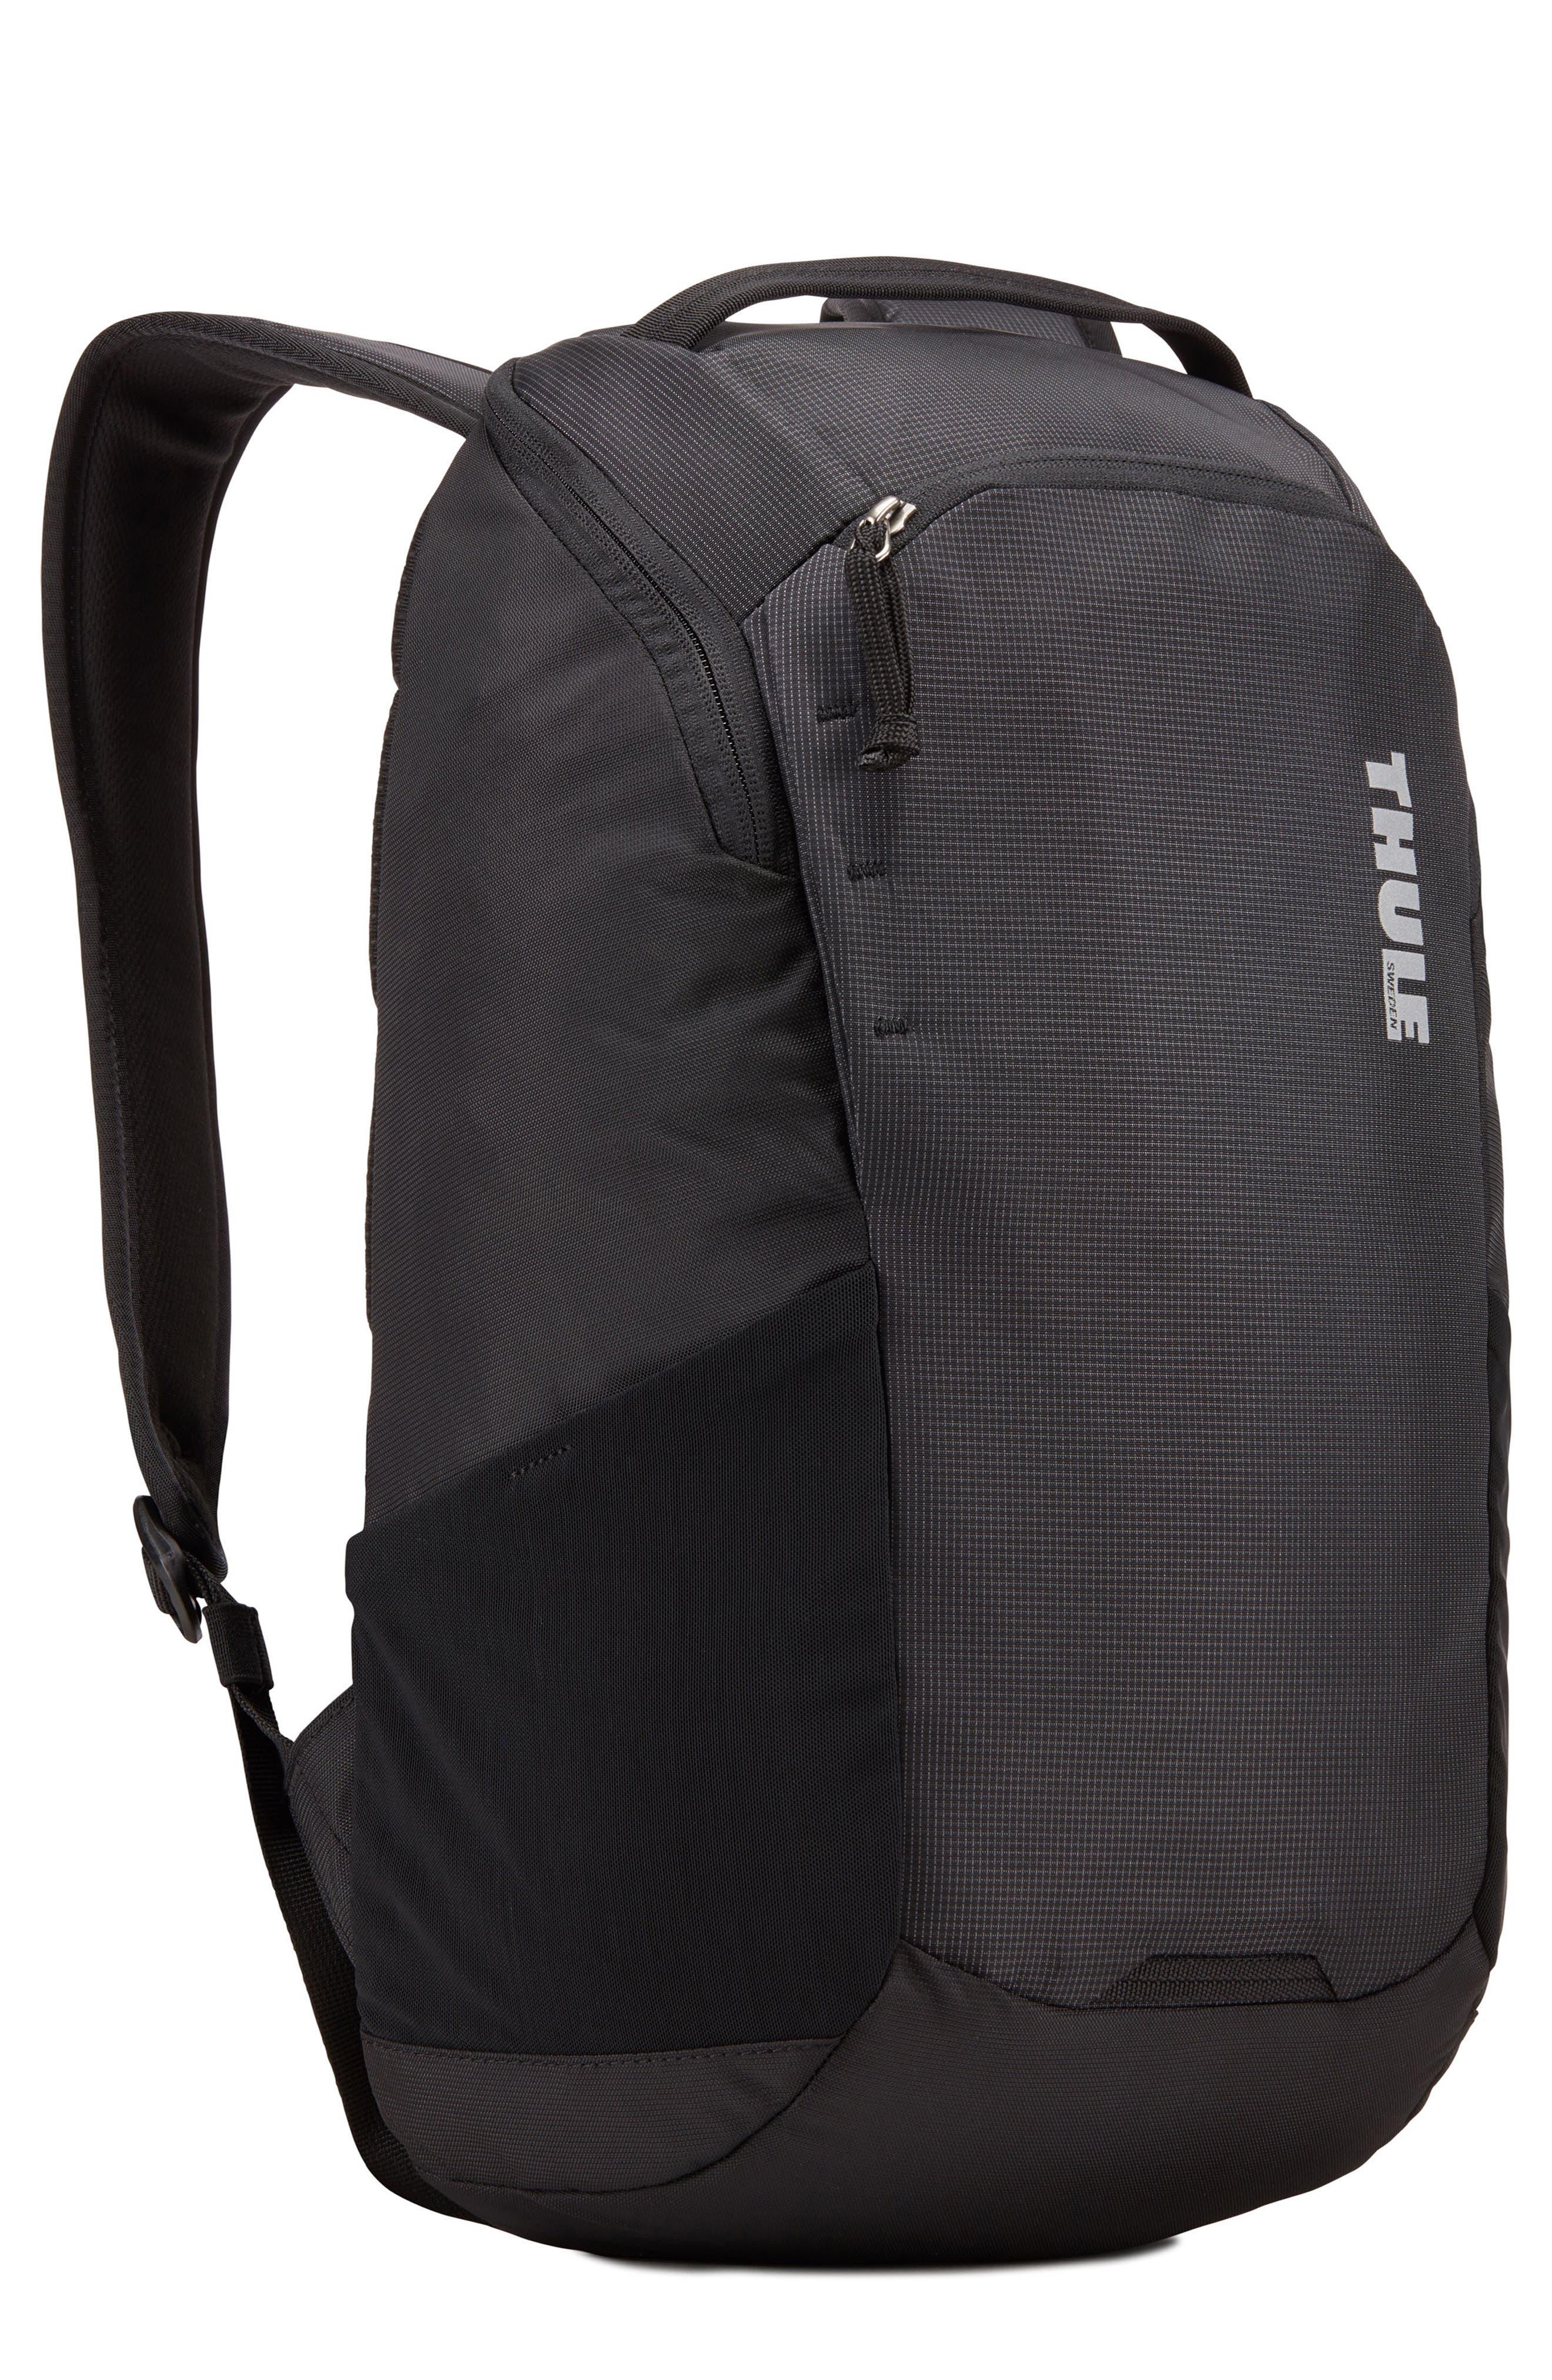 EnRoute Backpack,                         Main,                         color, BLACK